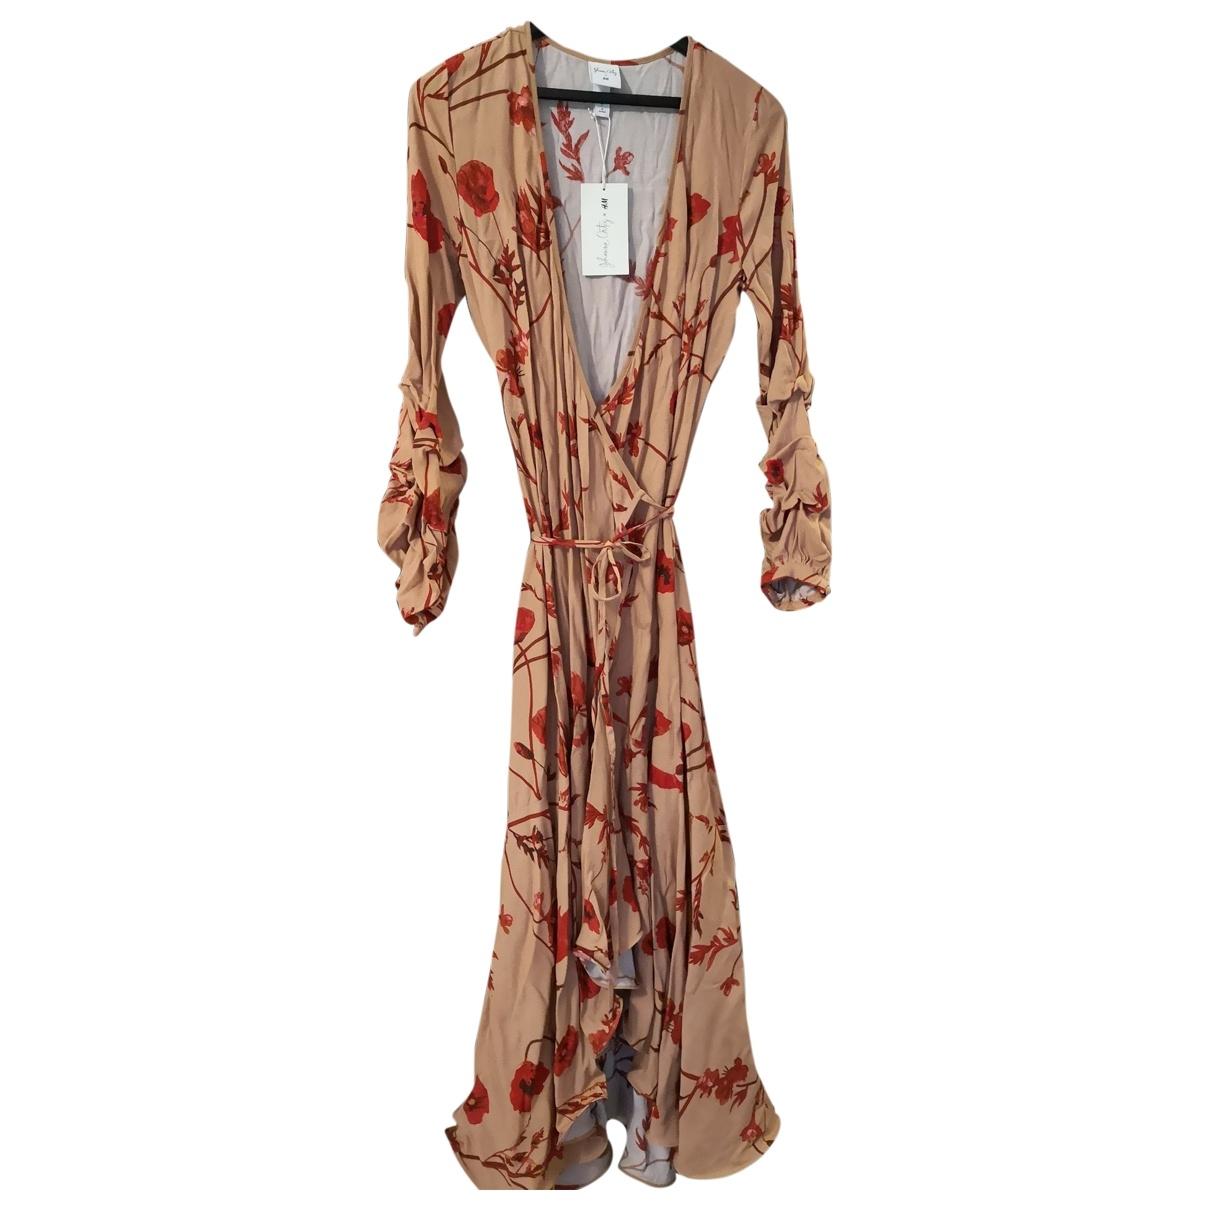 Johanna Ortiz X H&m \N Kleid in  Beige Viskose